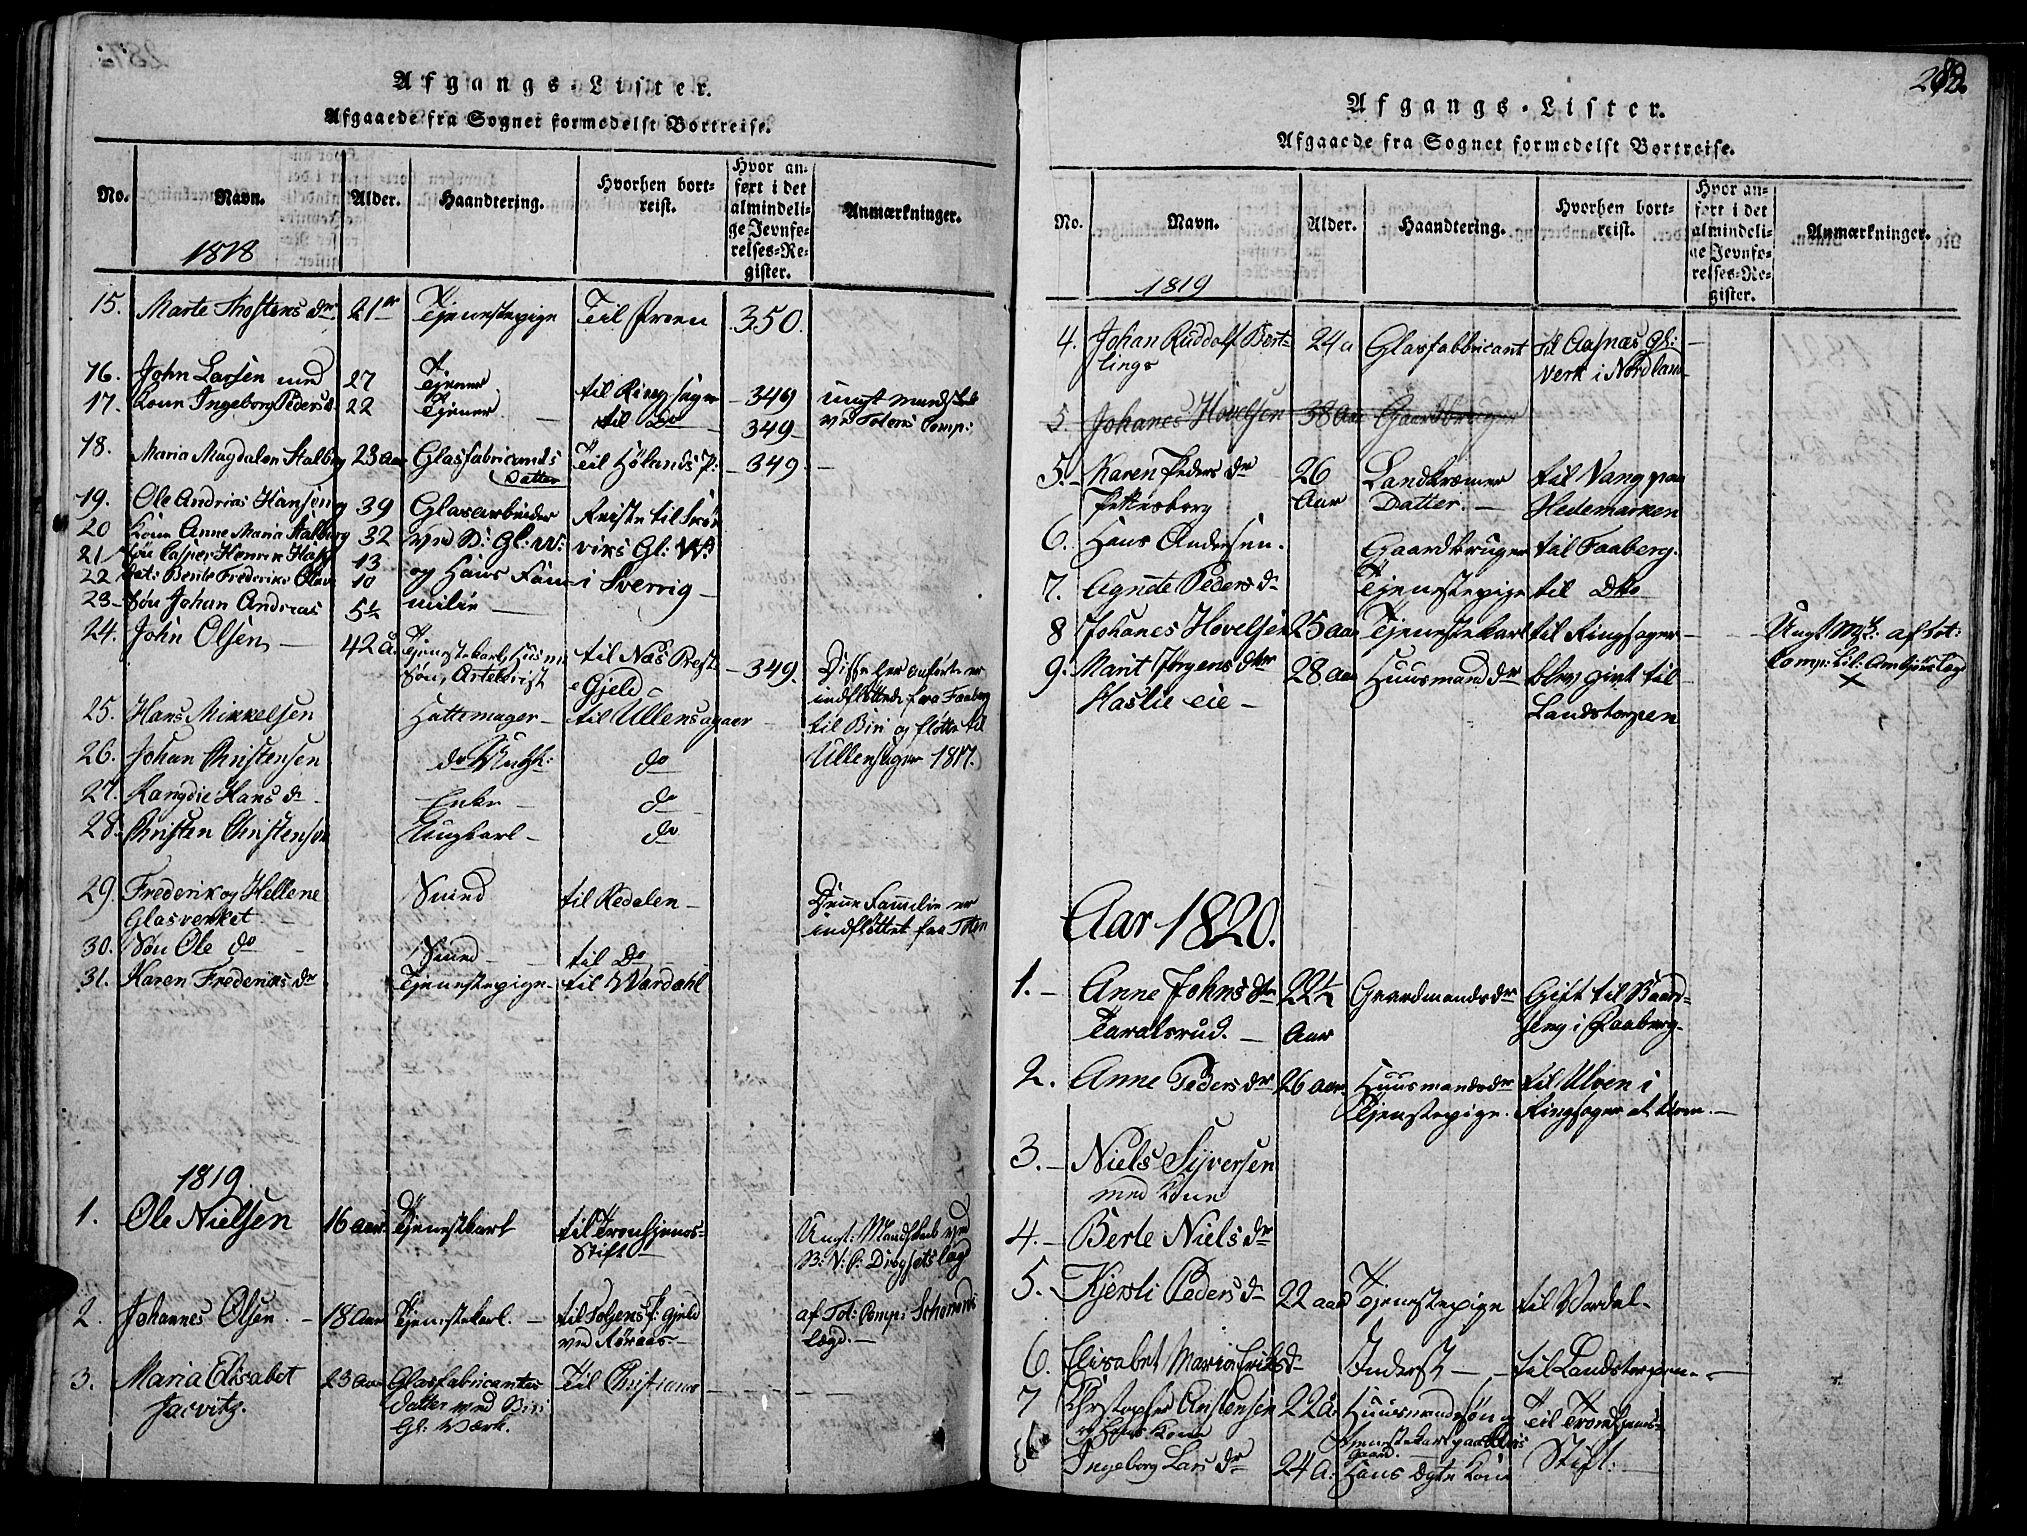 SAH, Biri prestekontor, Ministerialbok nr. 3, 1814-1828, s. 288